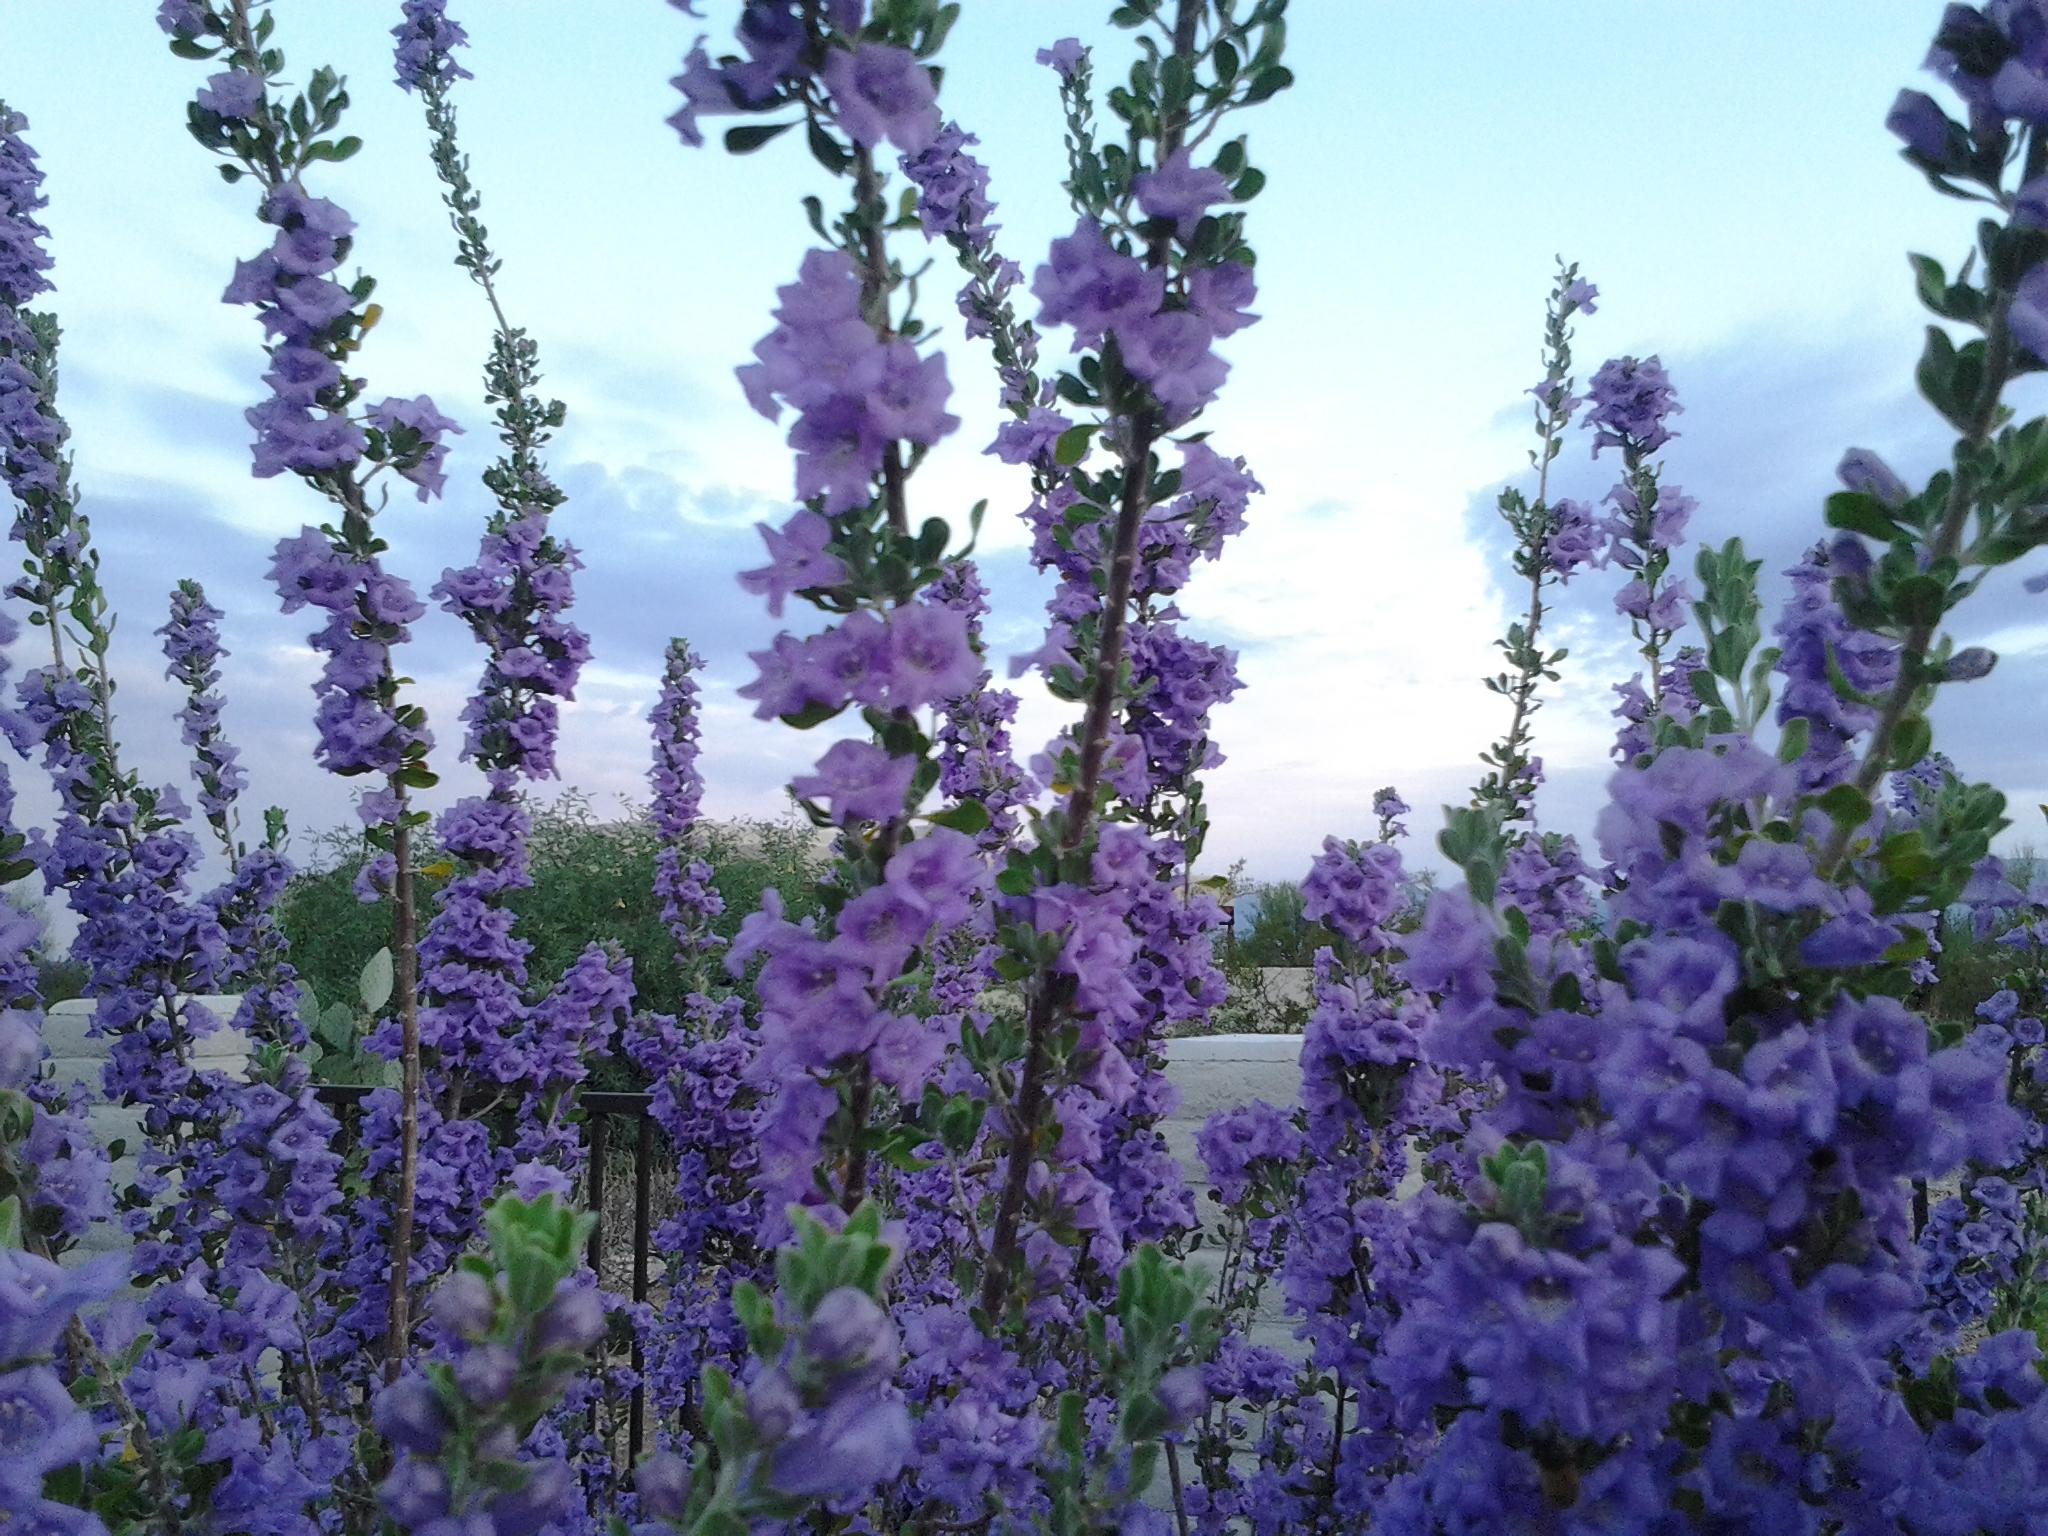 Shrubs with purple flowers pictures - Flowering Texas Ranger Shrub